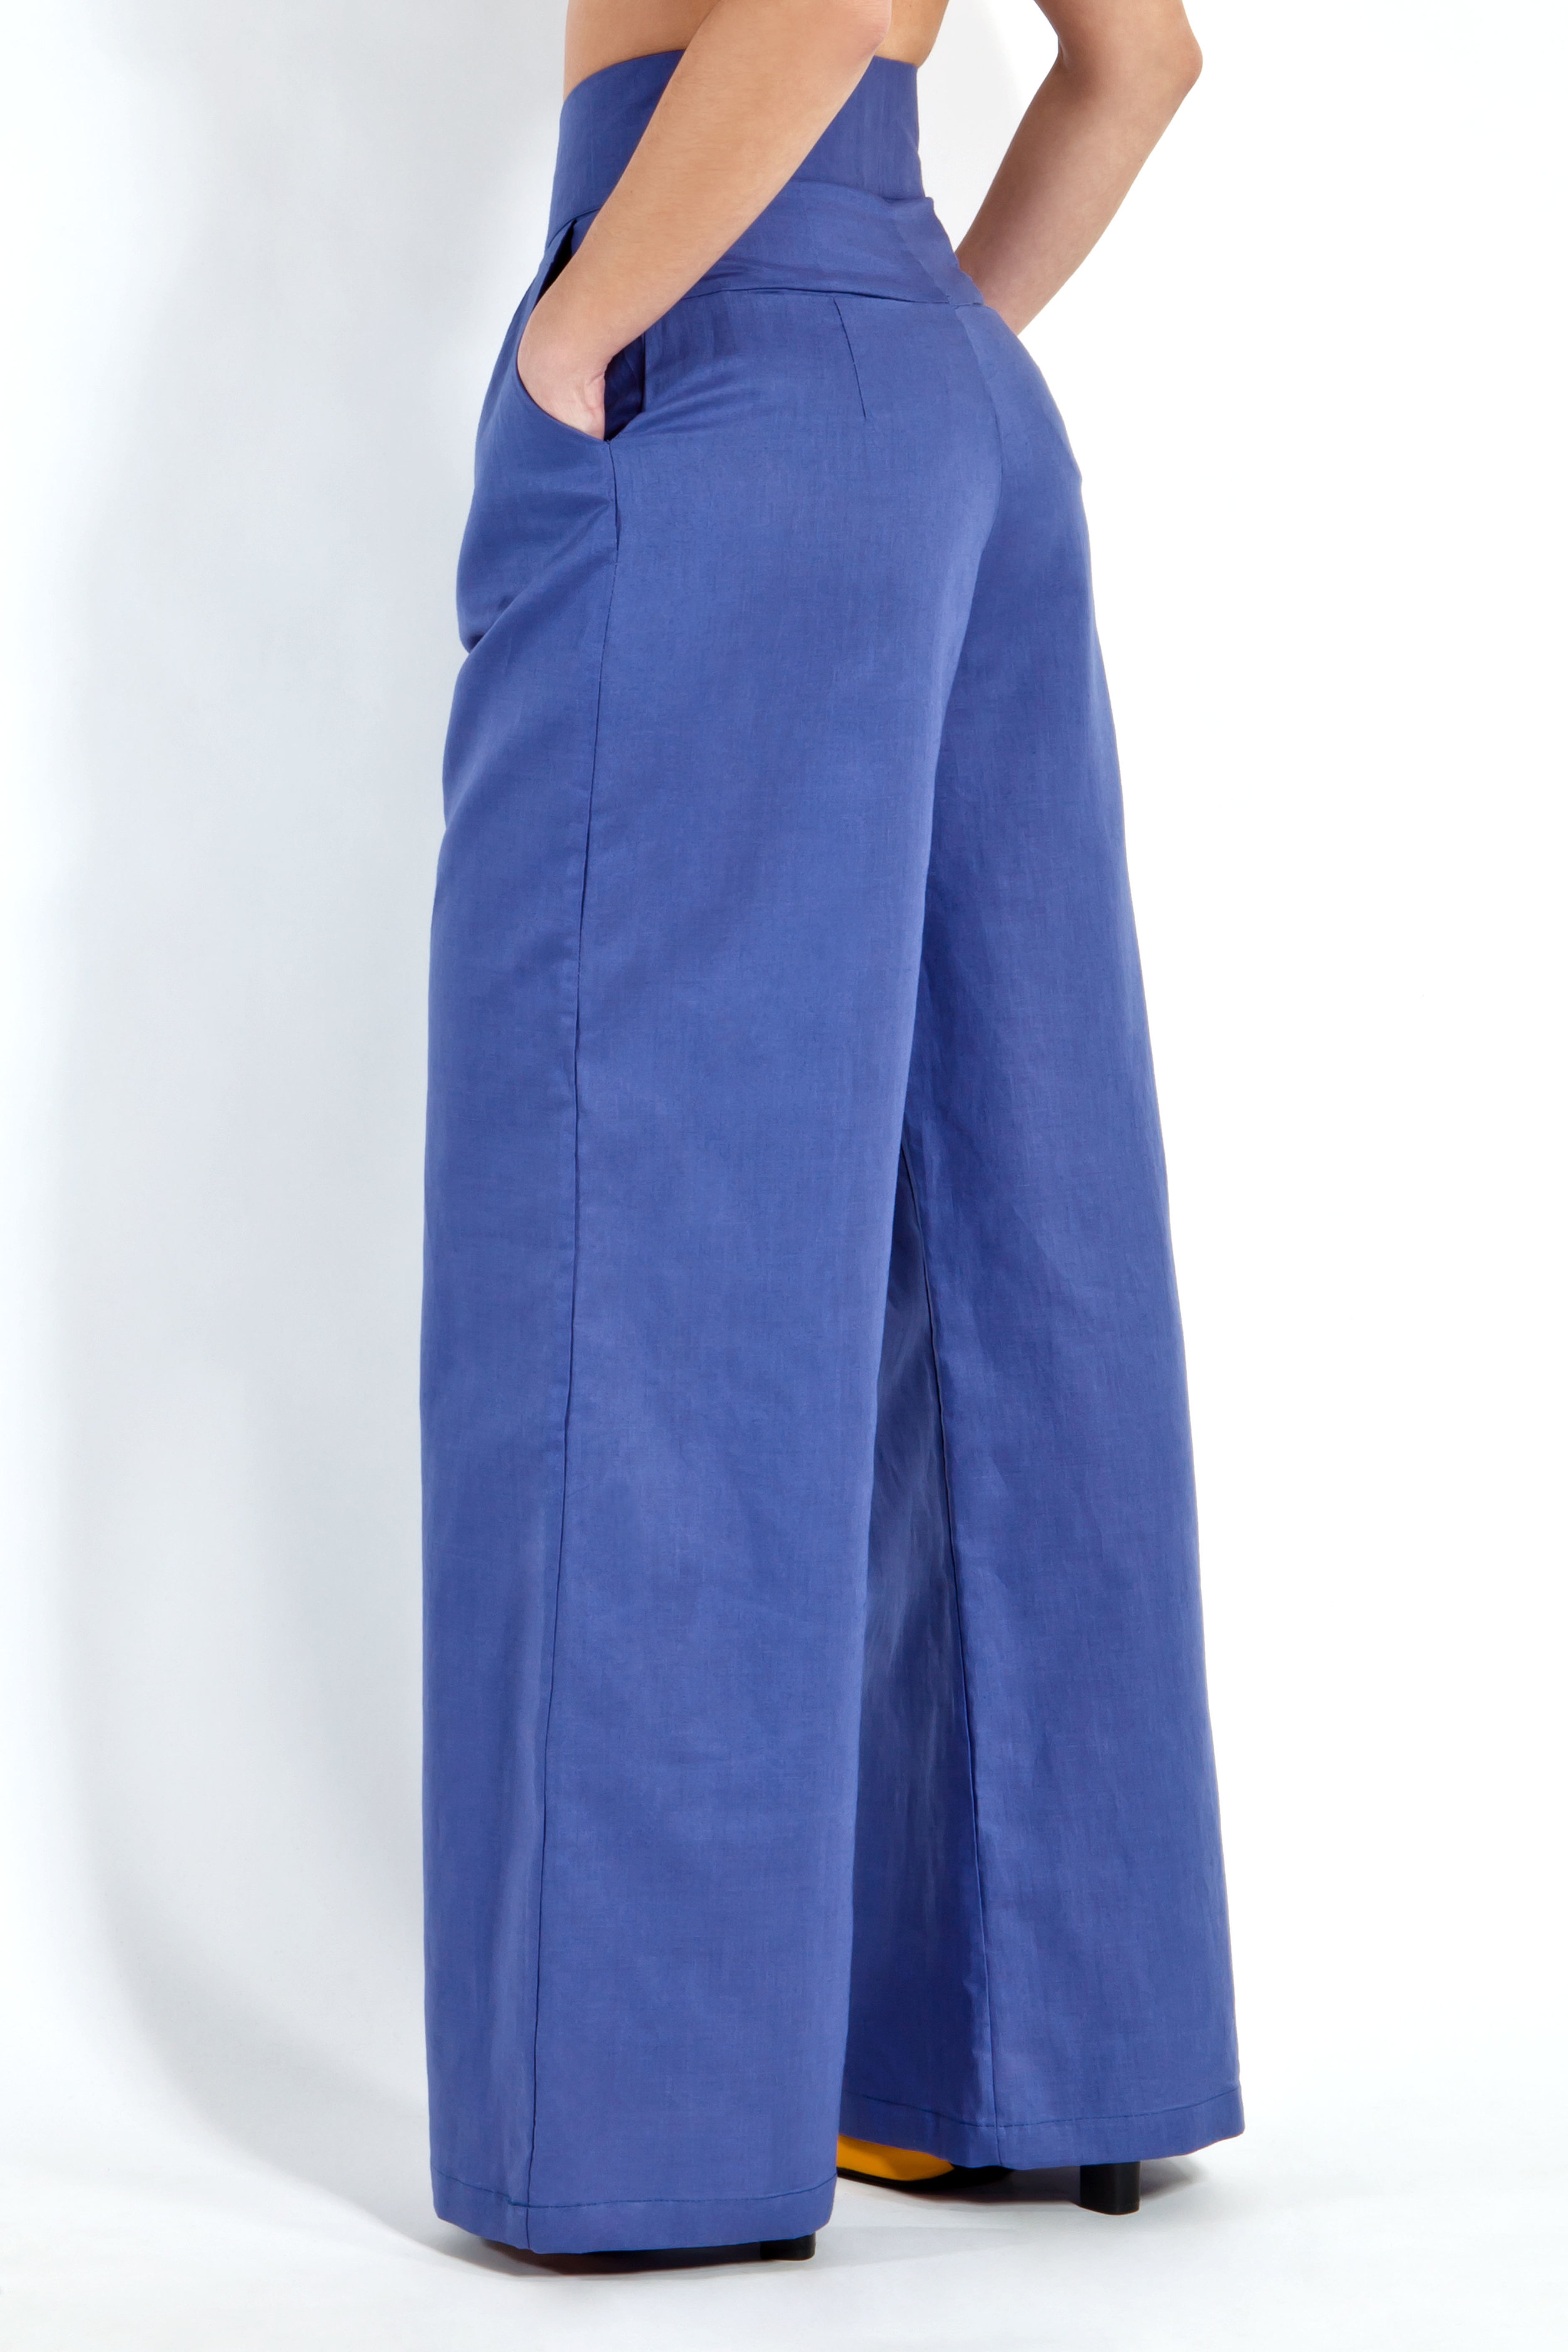 Indigo Linen Trousers